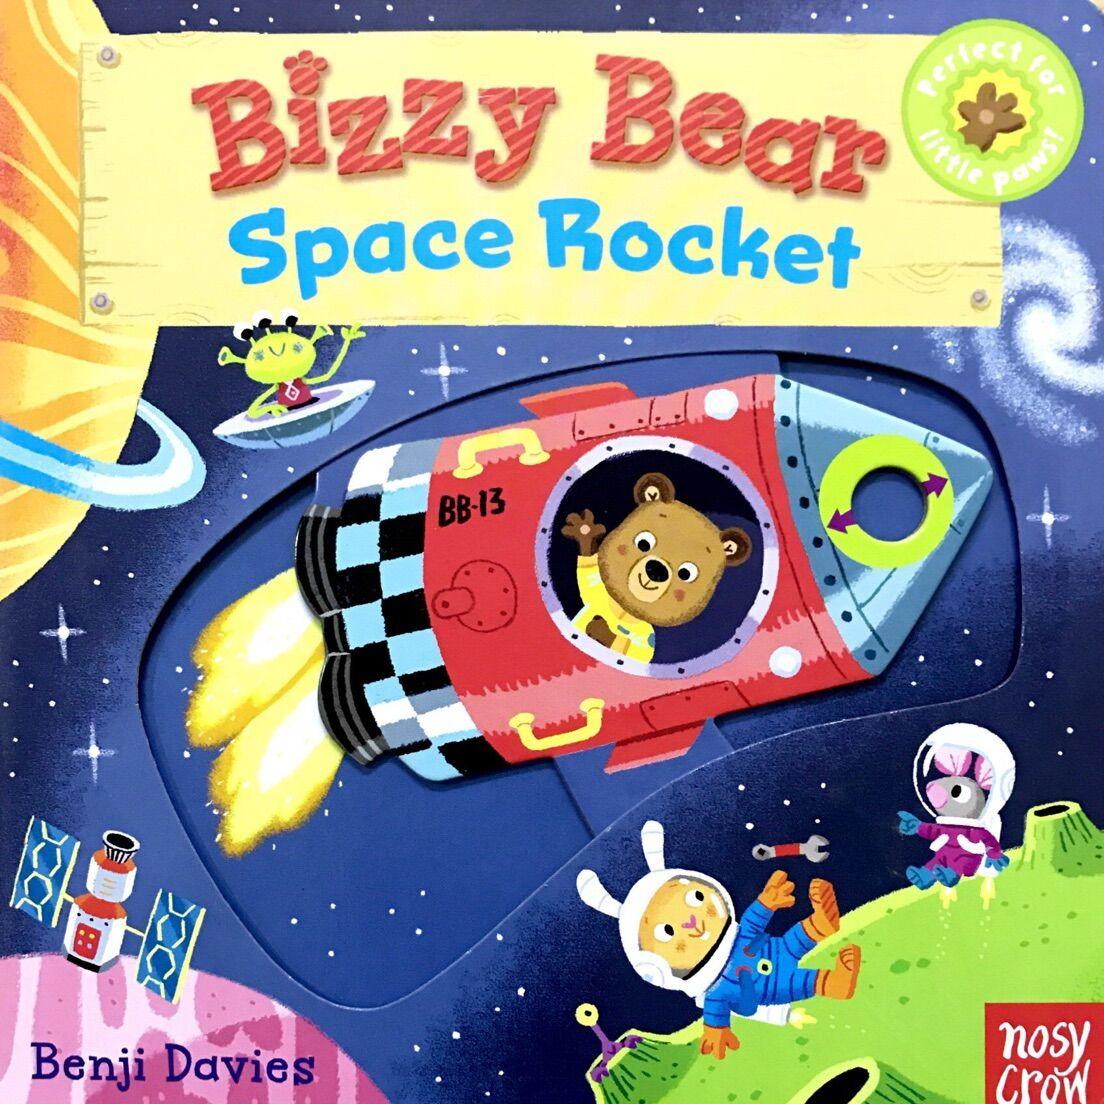 Bizzy Bear: Space Rocket 繁忙的小熊:太空火箭 纸板活动操作书 (无红标)